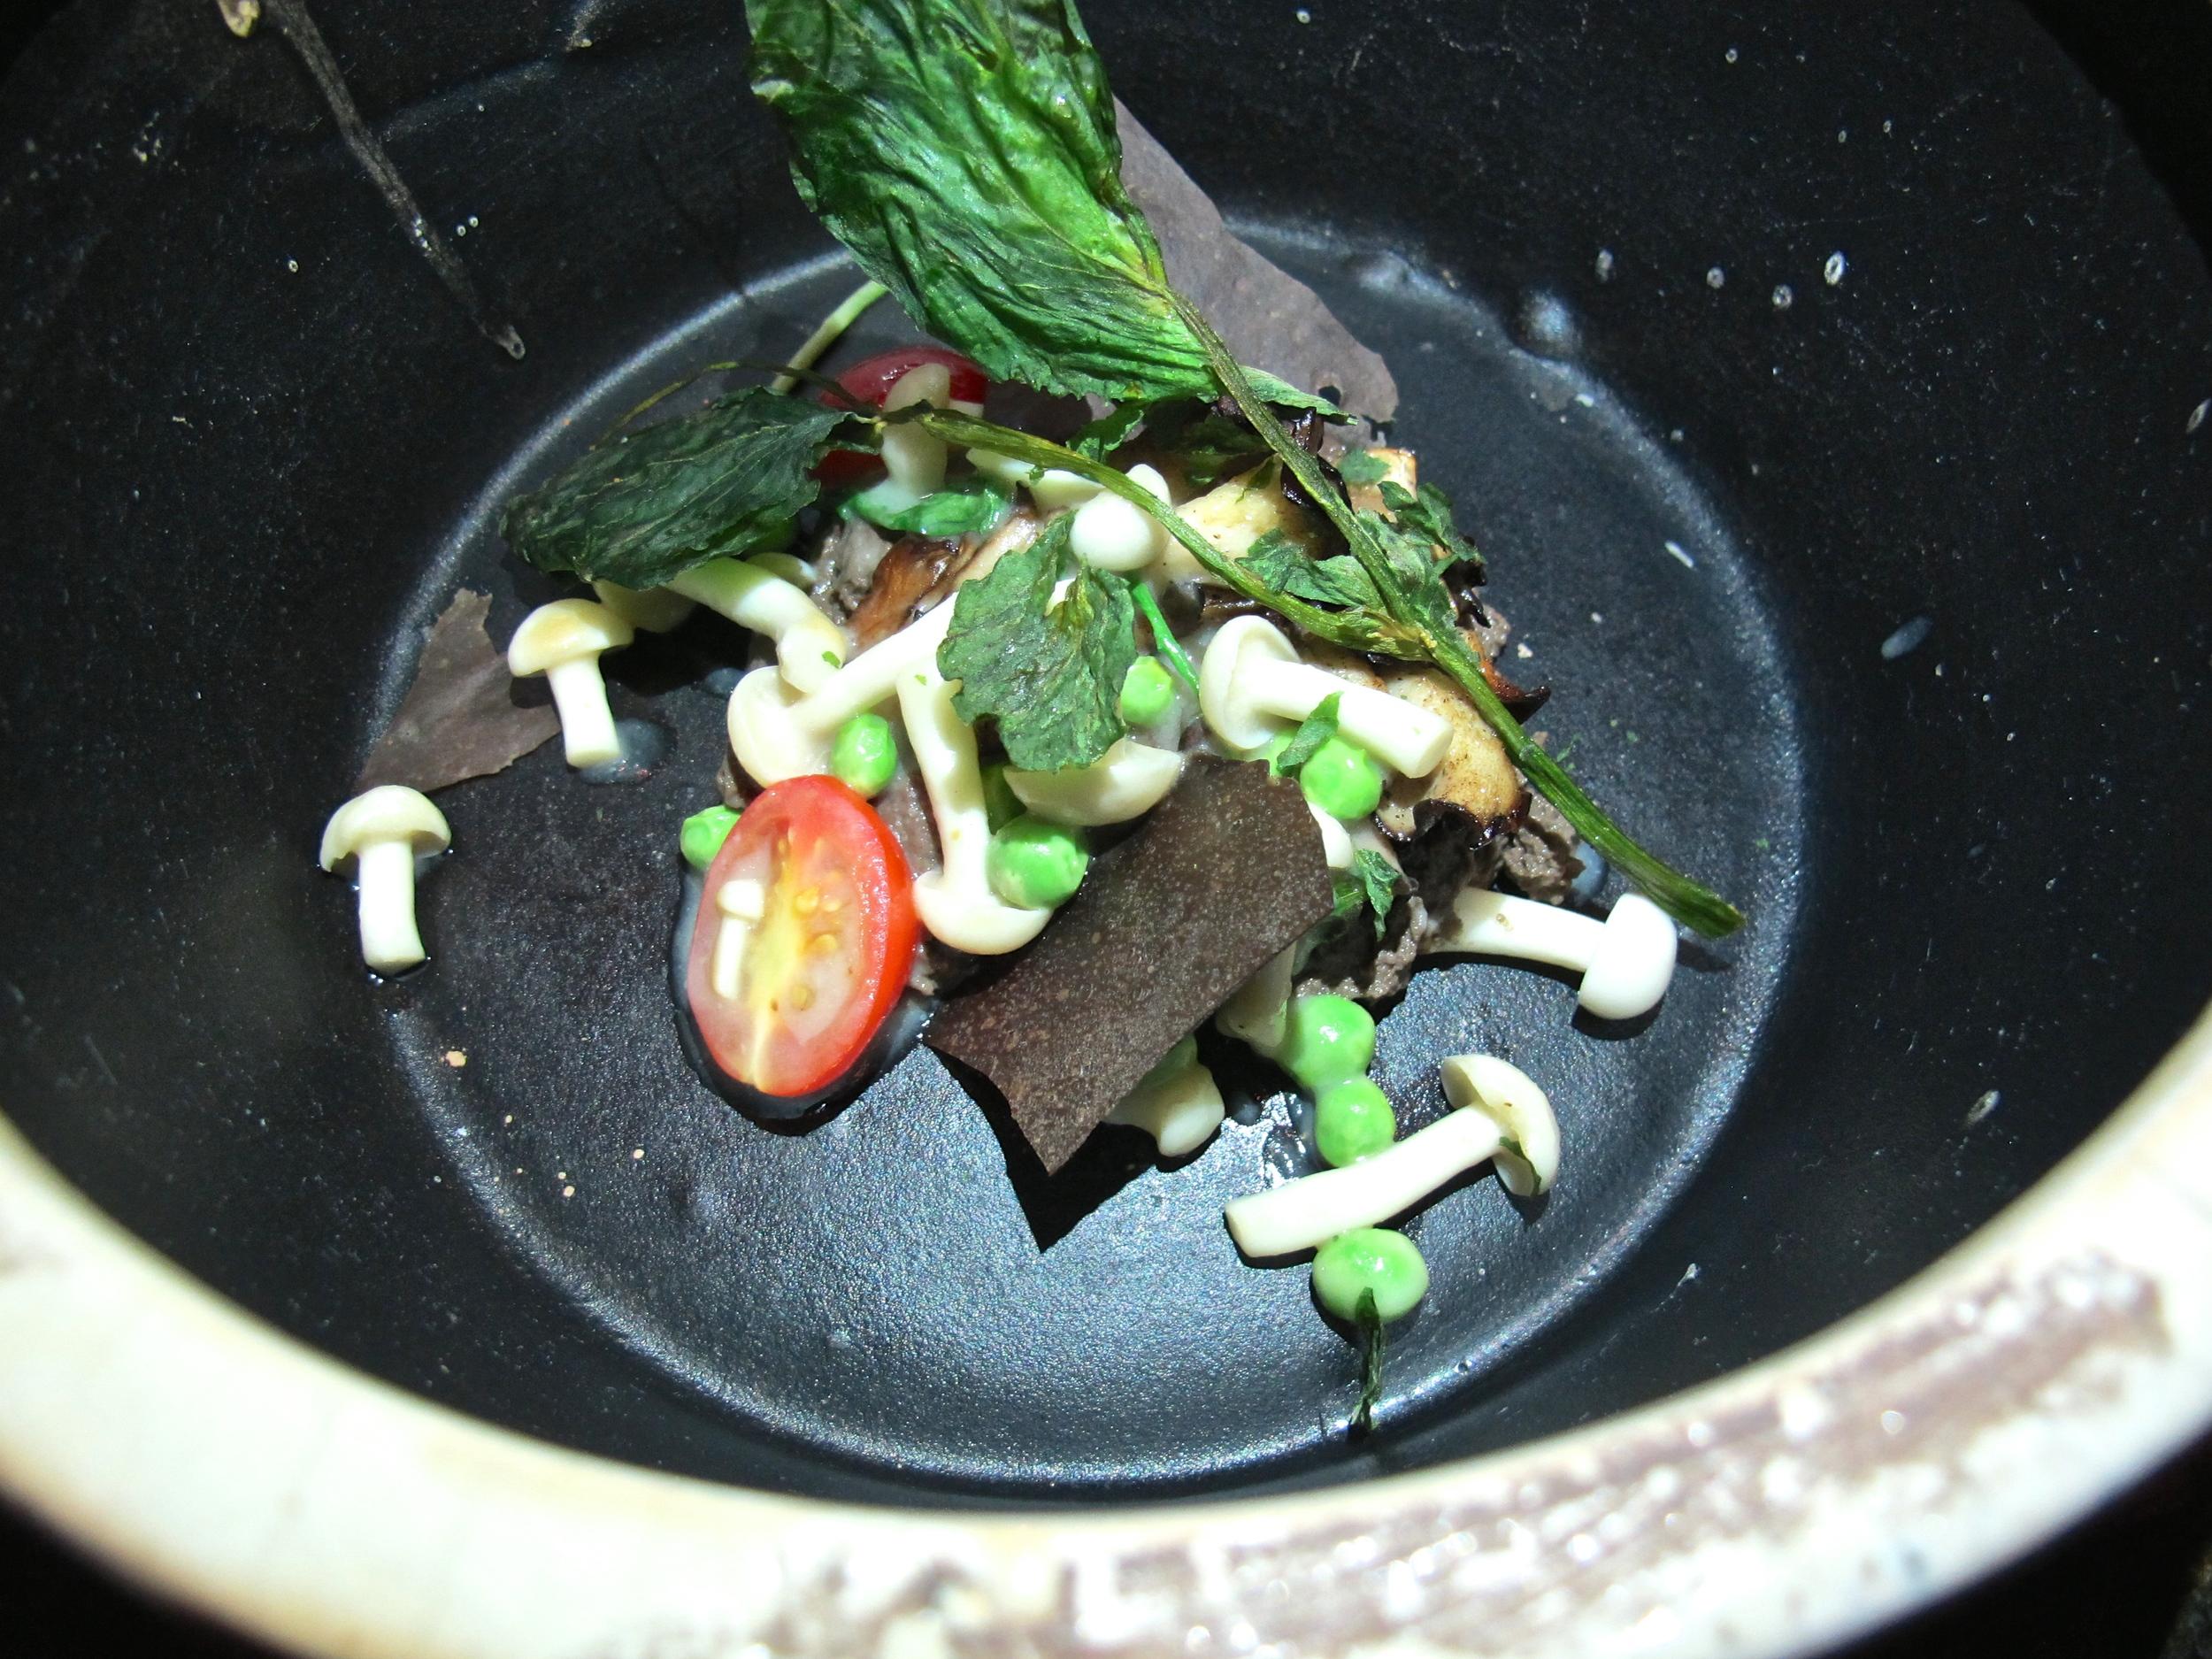 Gadarene Swine mushrooms